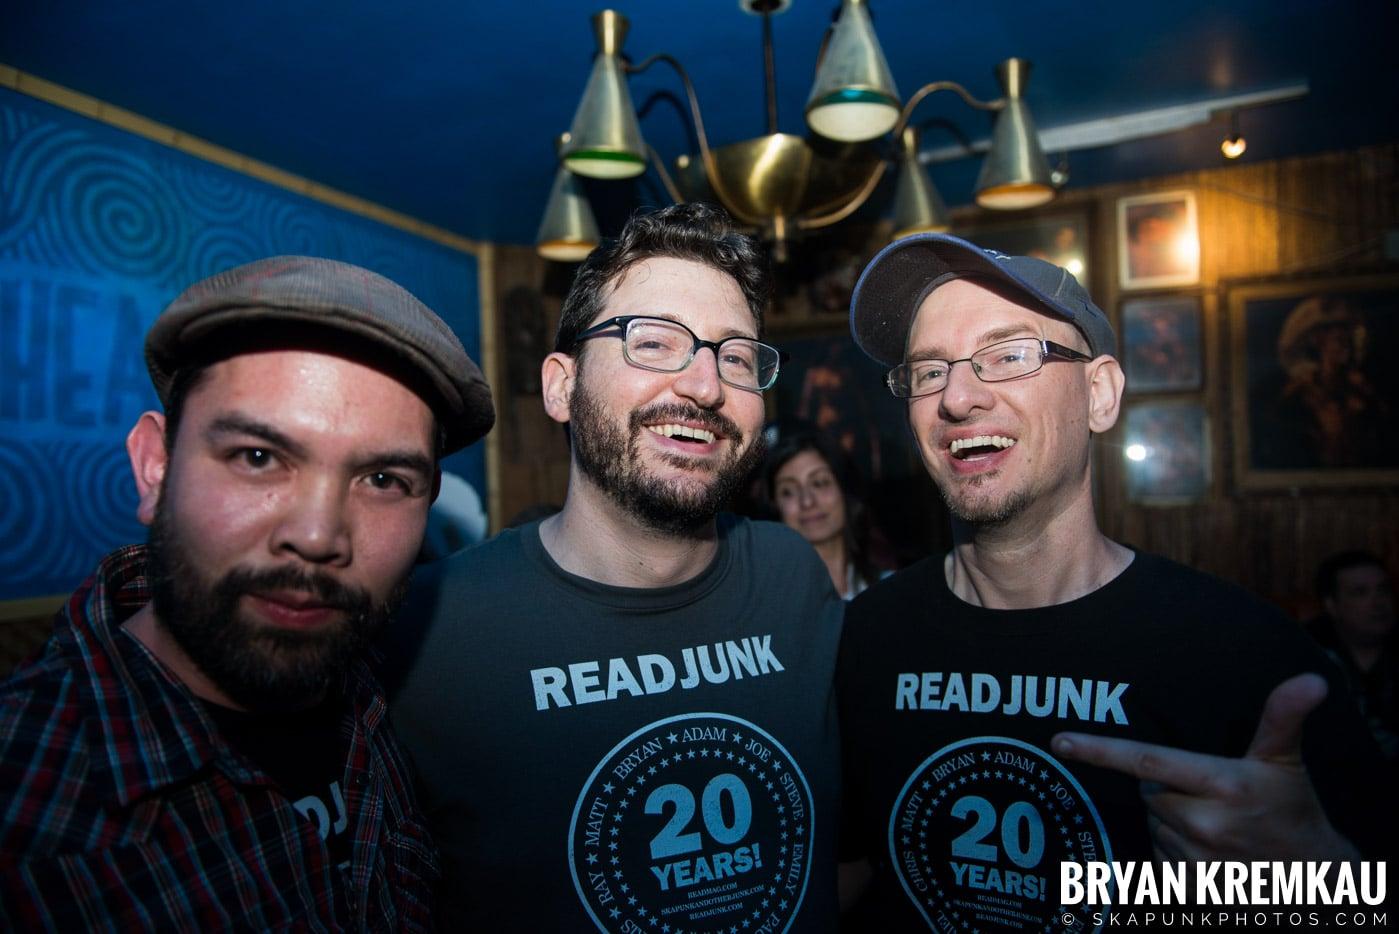 ReadJunk.com 20th Anniversary Party @ Otto's Shrunken Head, NYC - 4.29.17 (6)